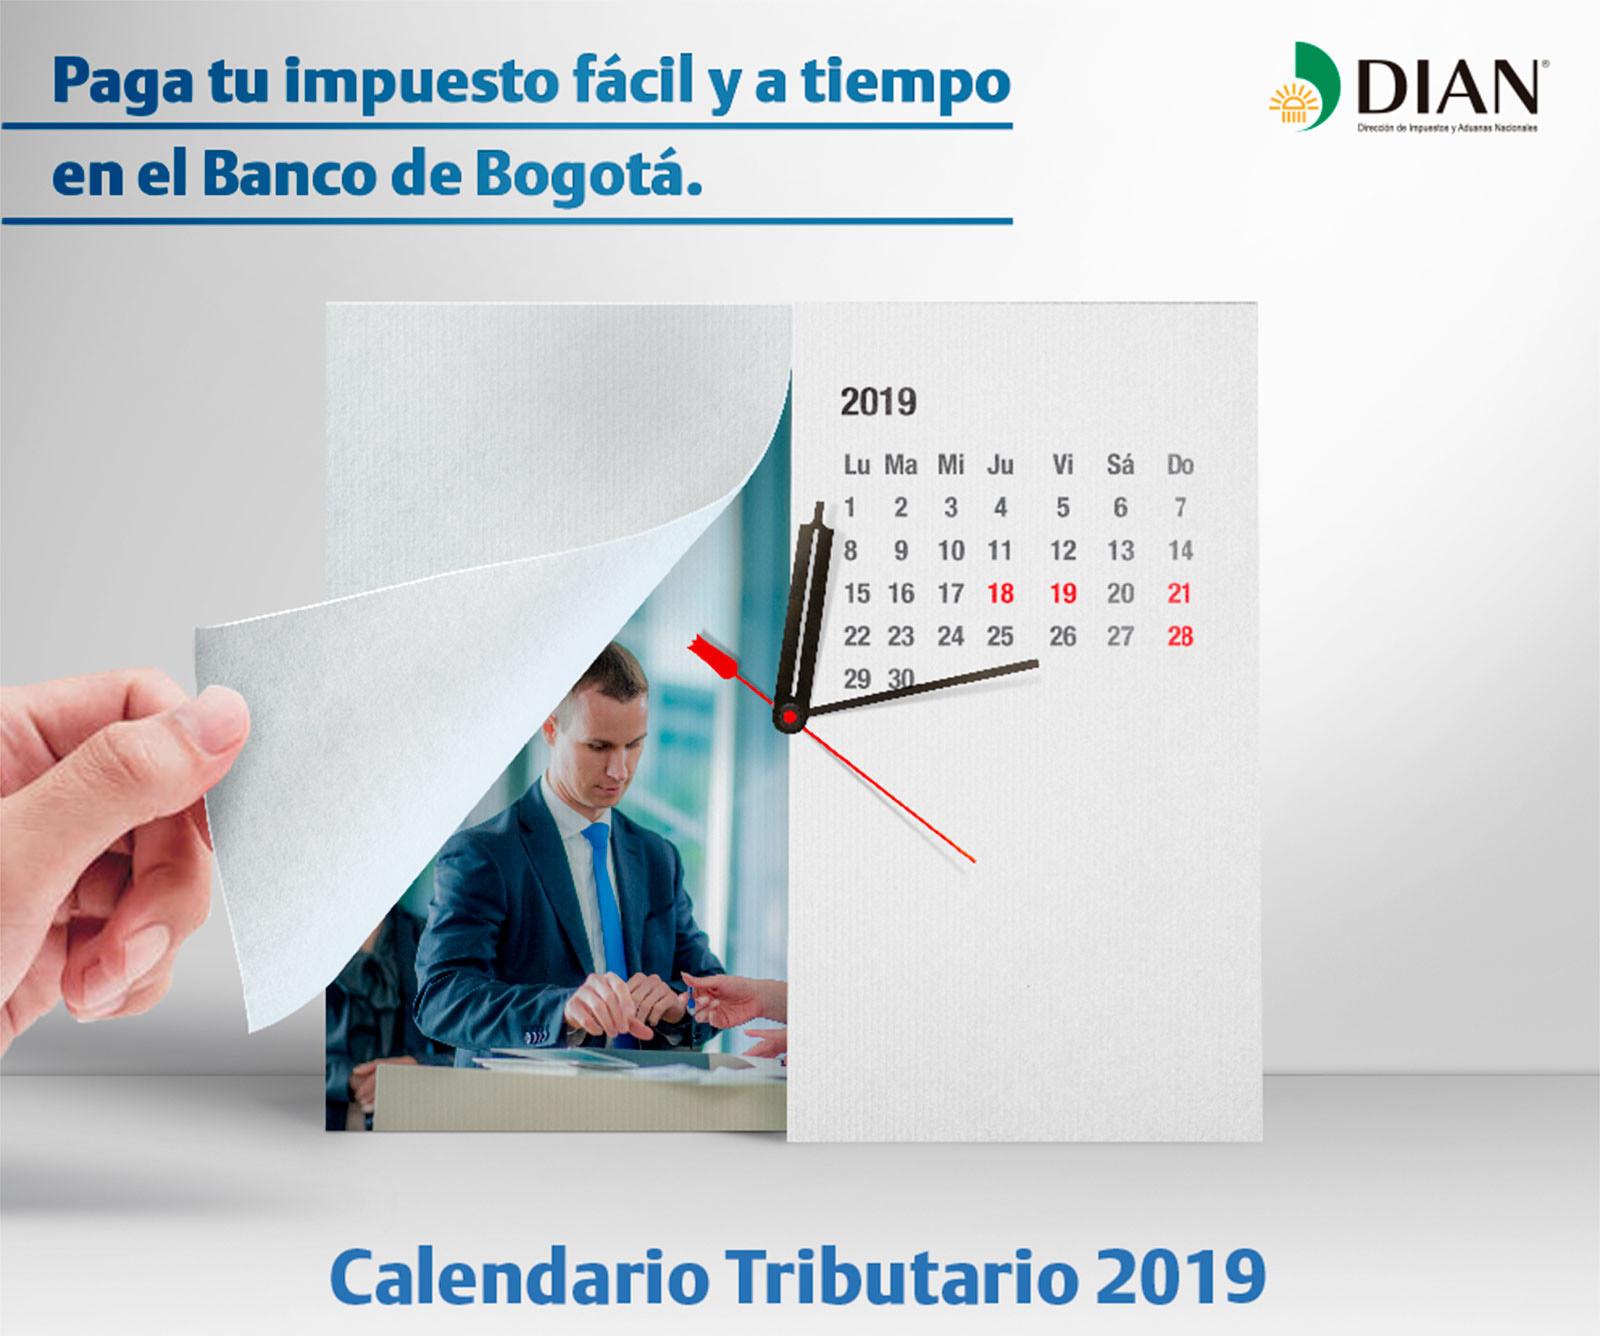 Calendario Tributario Banco De Bogota